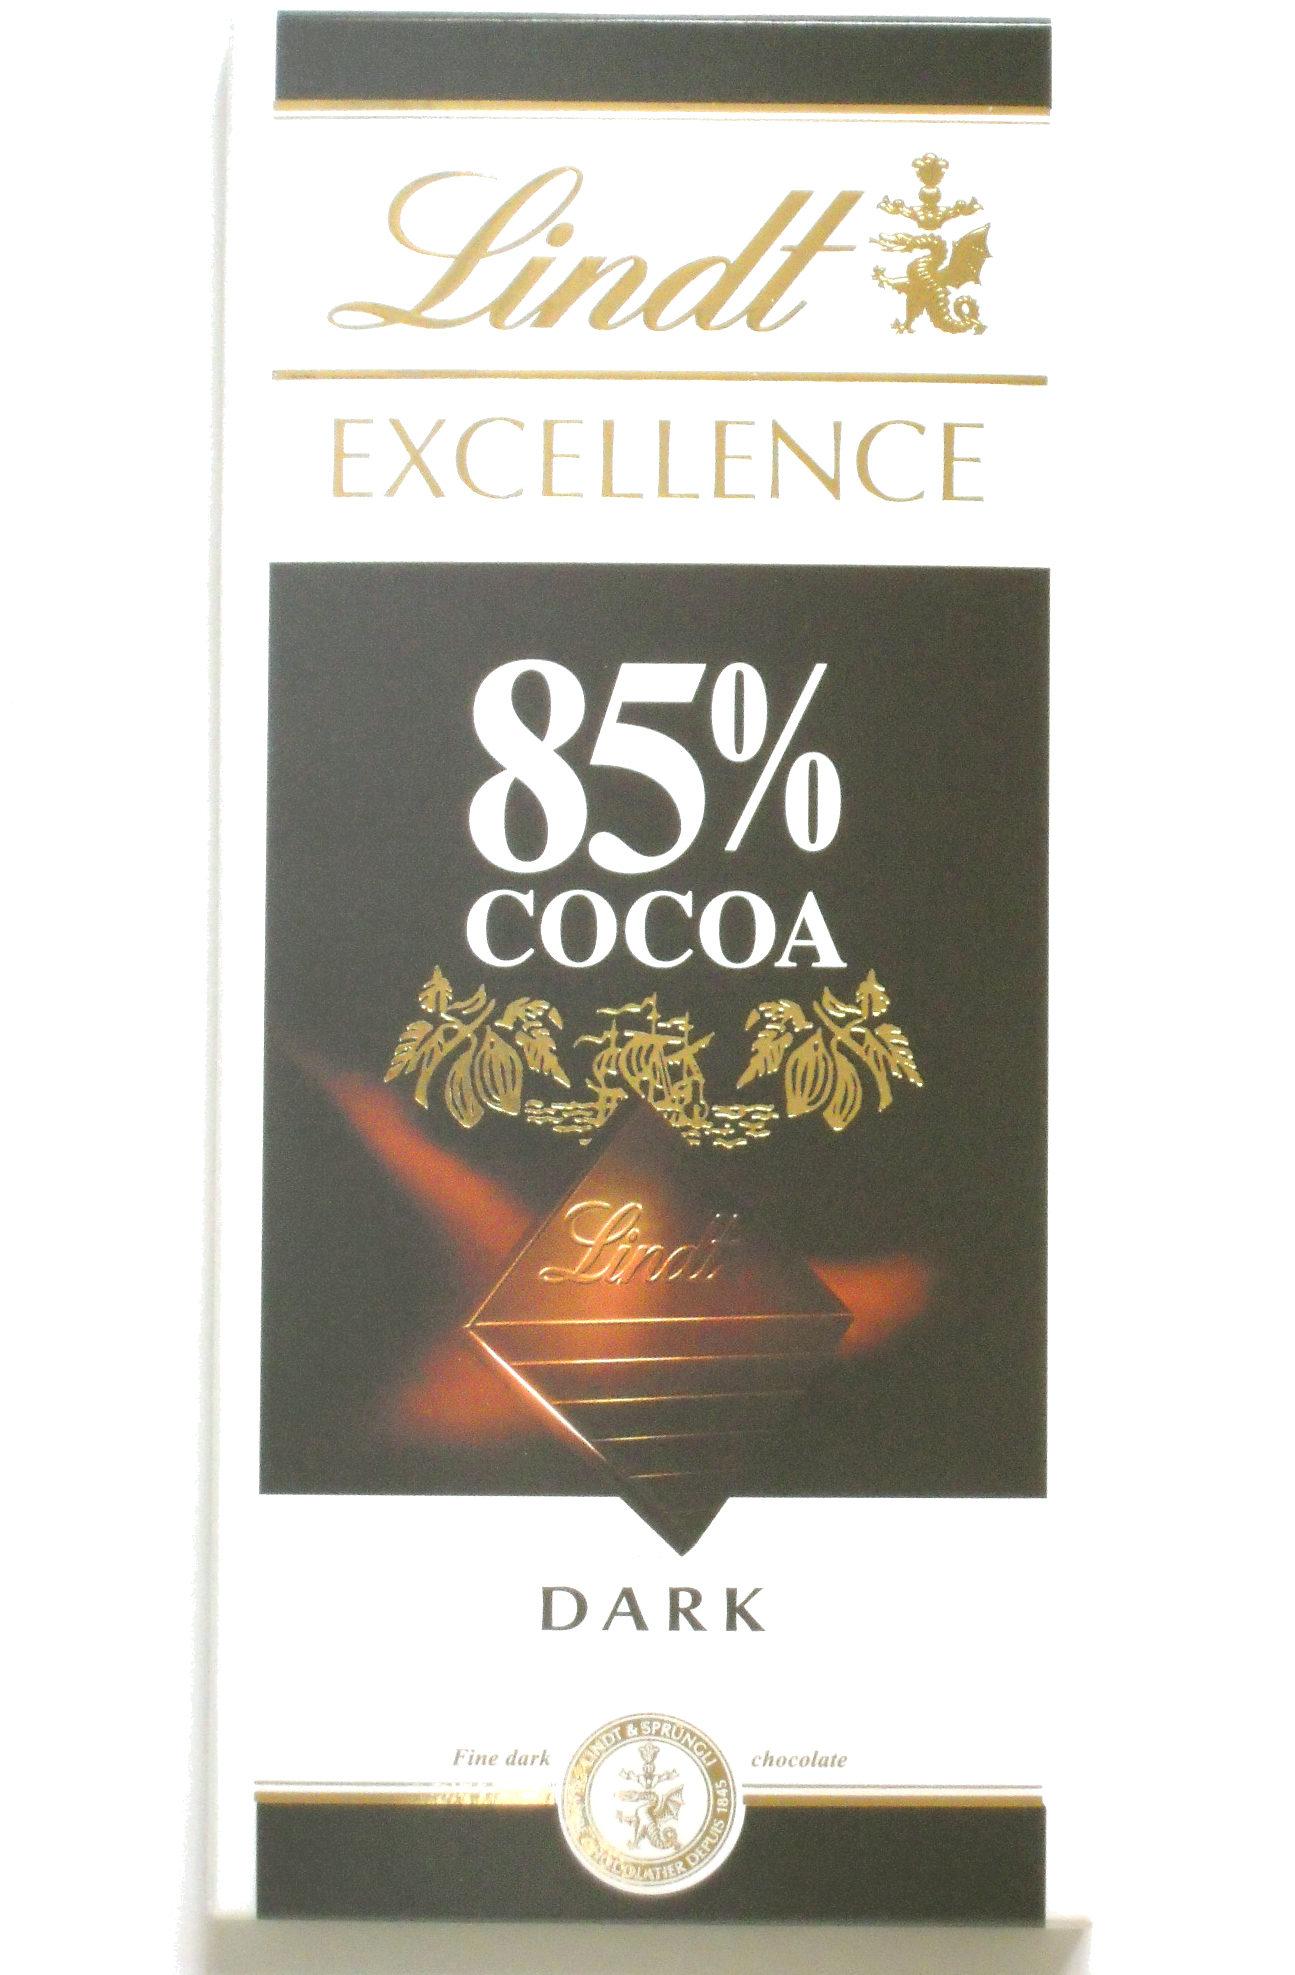 Chocolate 85% cacao - Продукт - ru